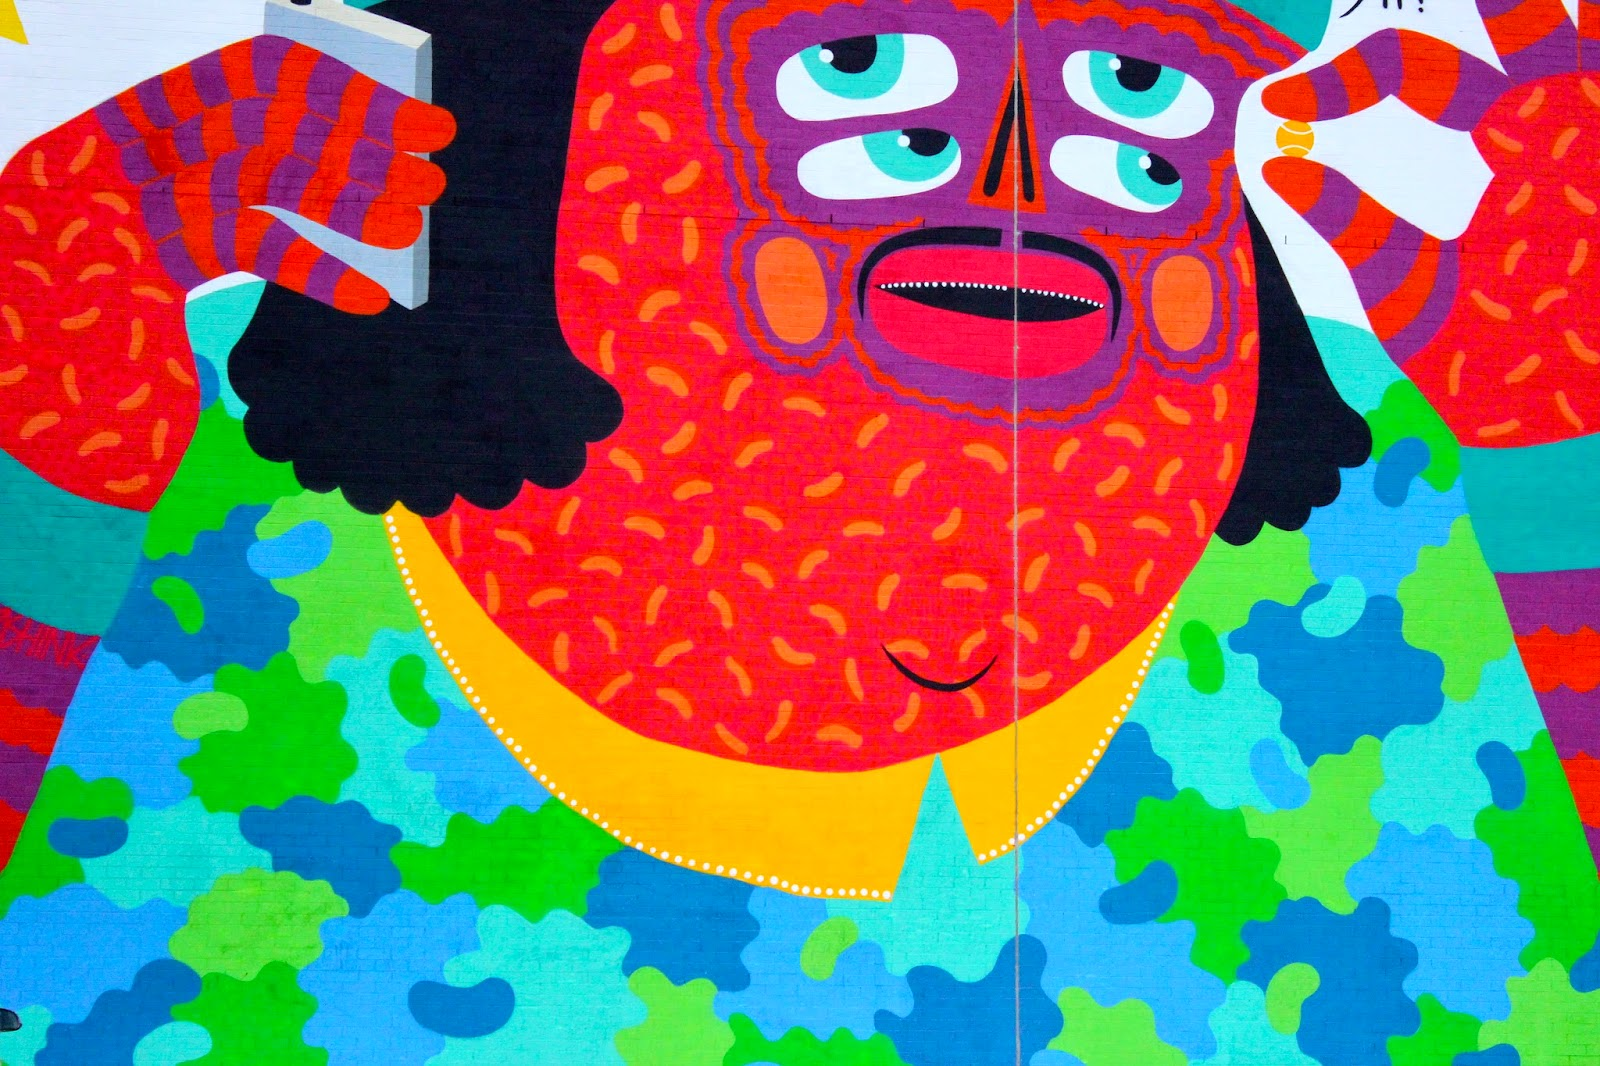 KASHINK street art mural festival fashion blog st laurent nightlife montreal bars